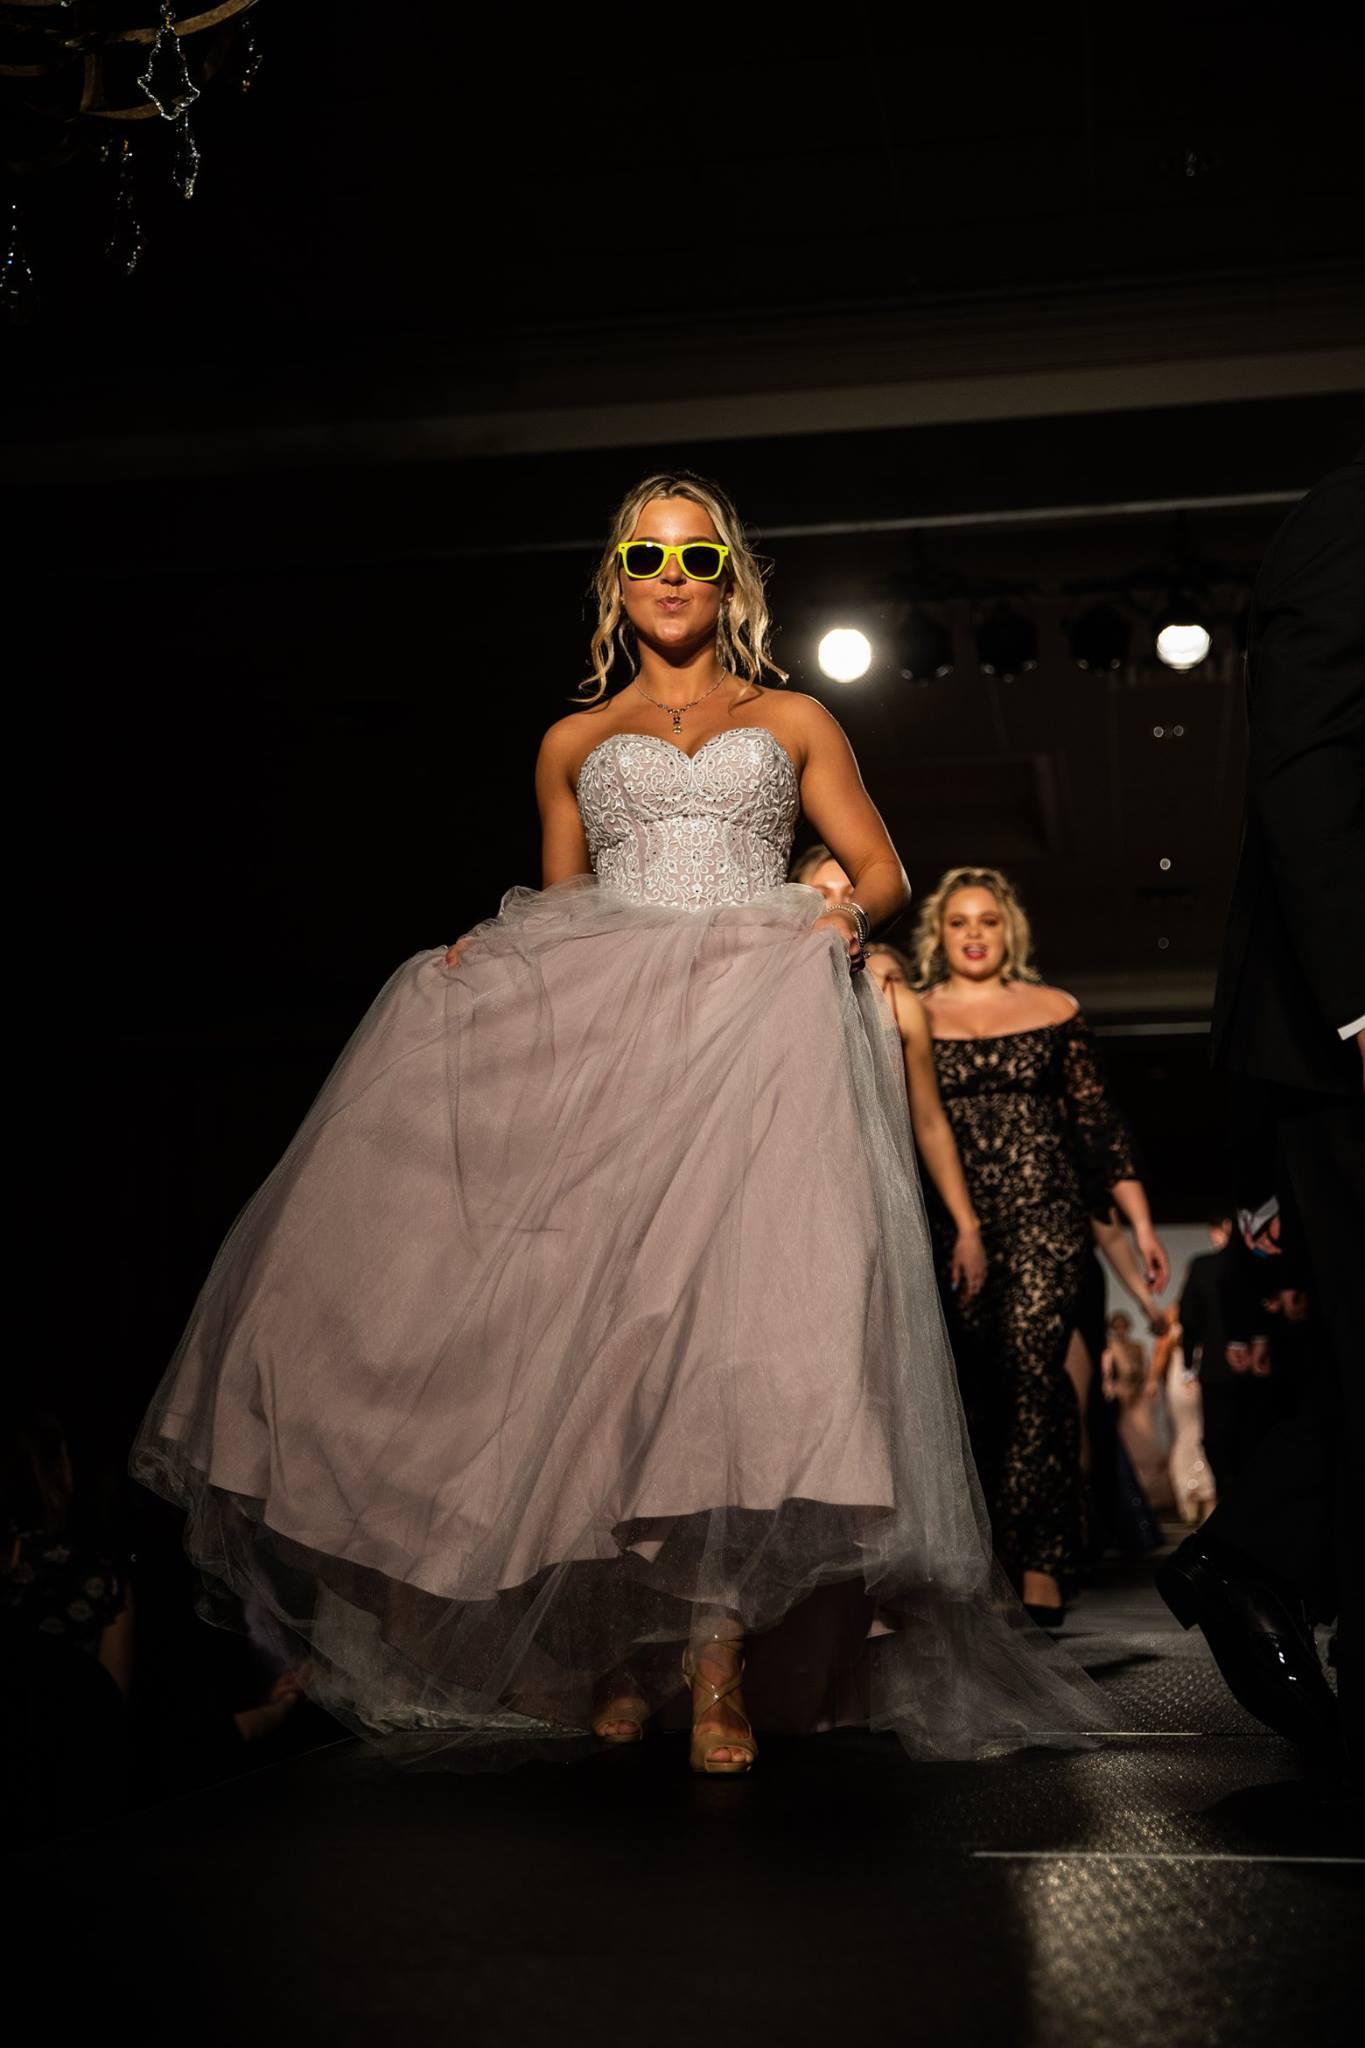 Lutheran_North_High_School_Macomb_Michigan_LHN_Fashion_Show_2019_Seniors (31).jpg